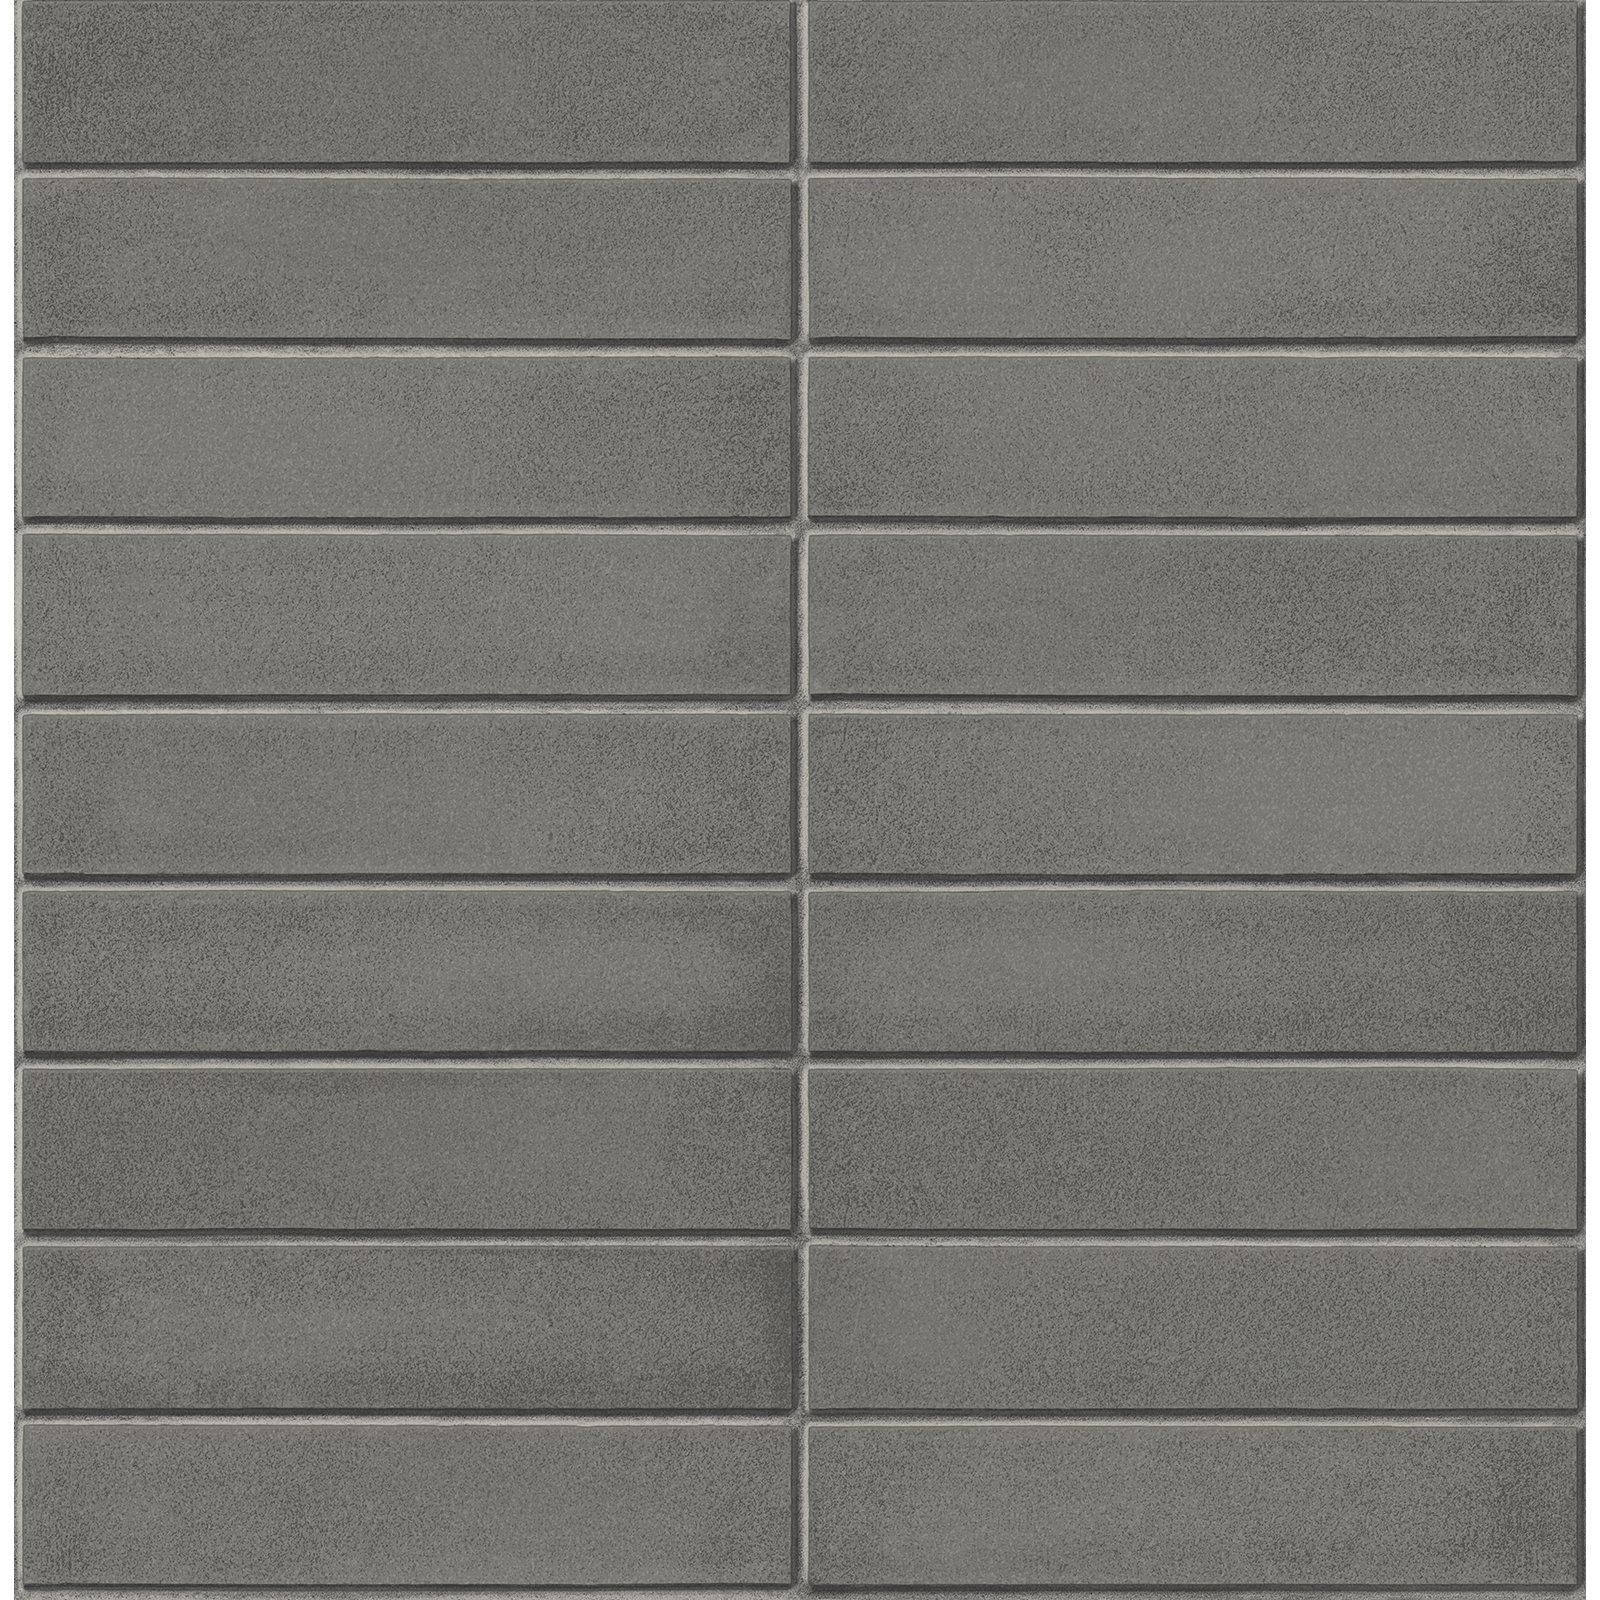 AStreet Prints Midcentury Modern Brick Wallpaper Brick